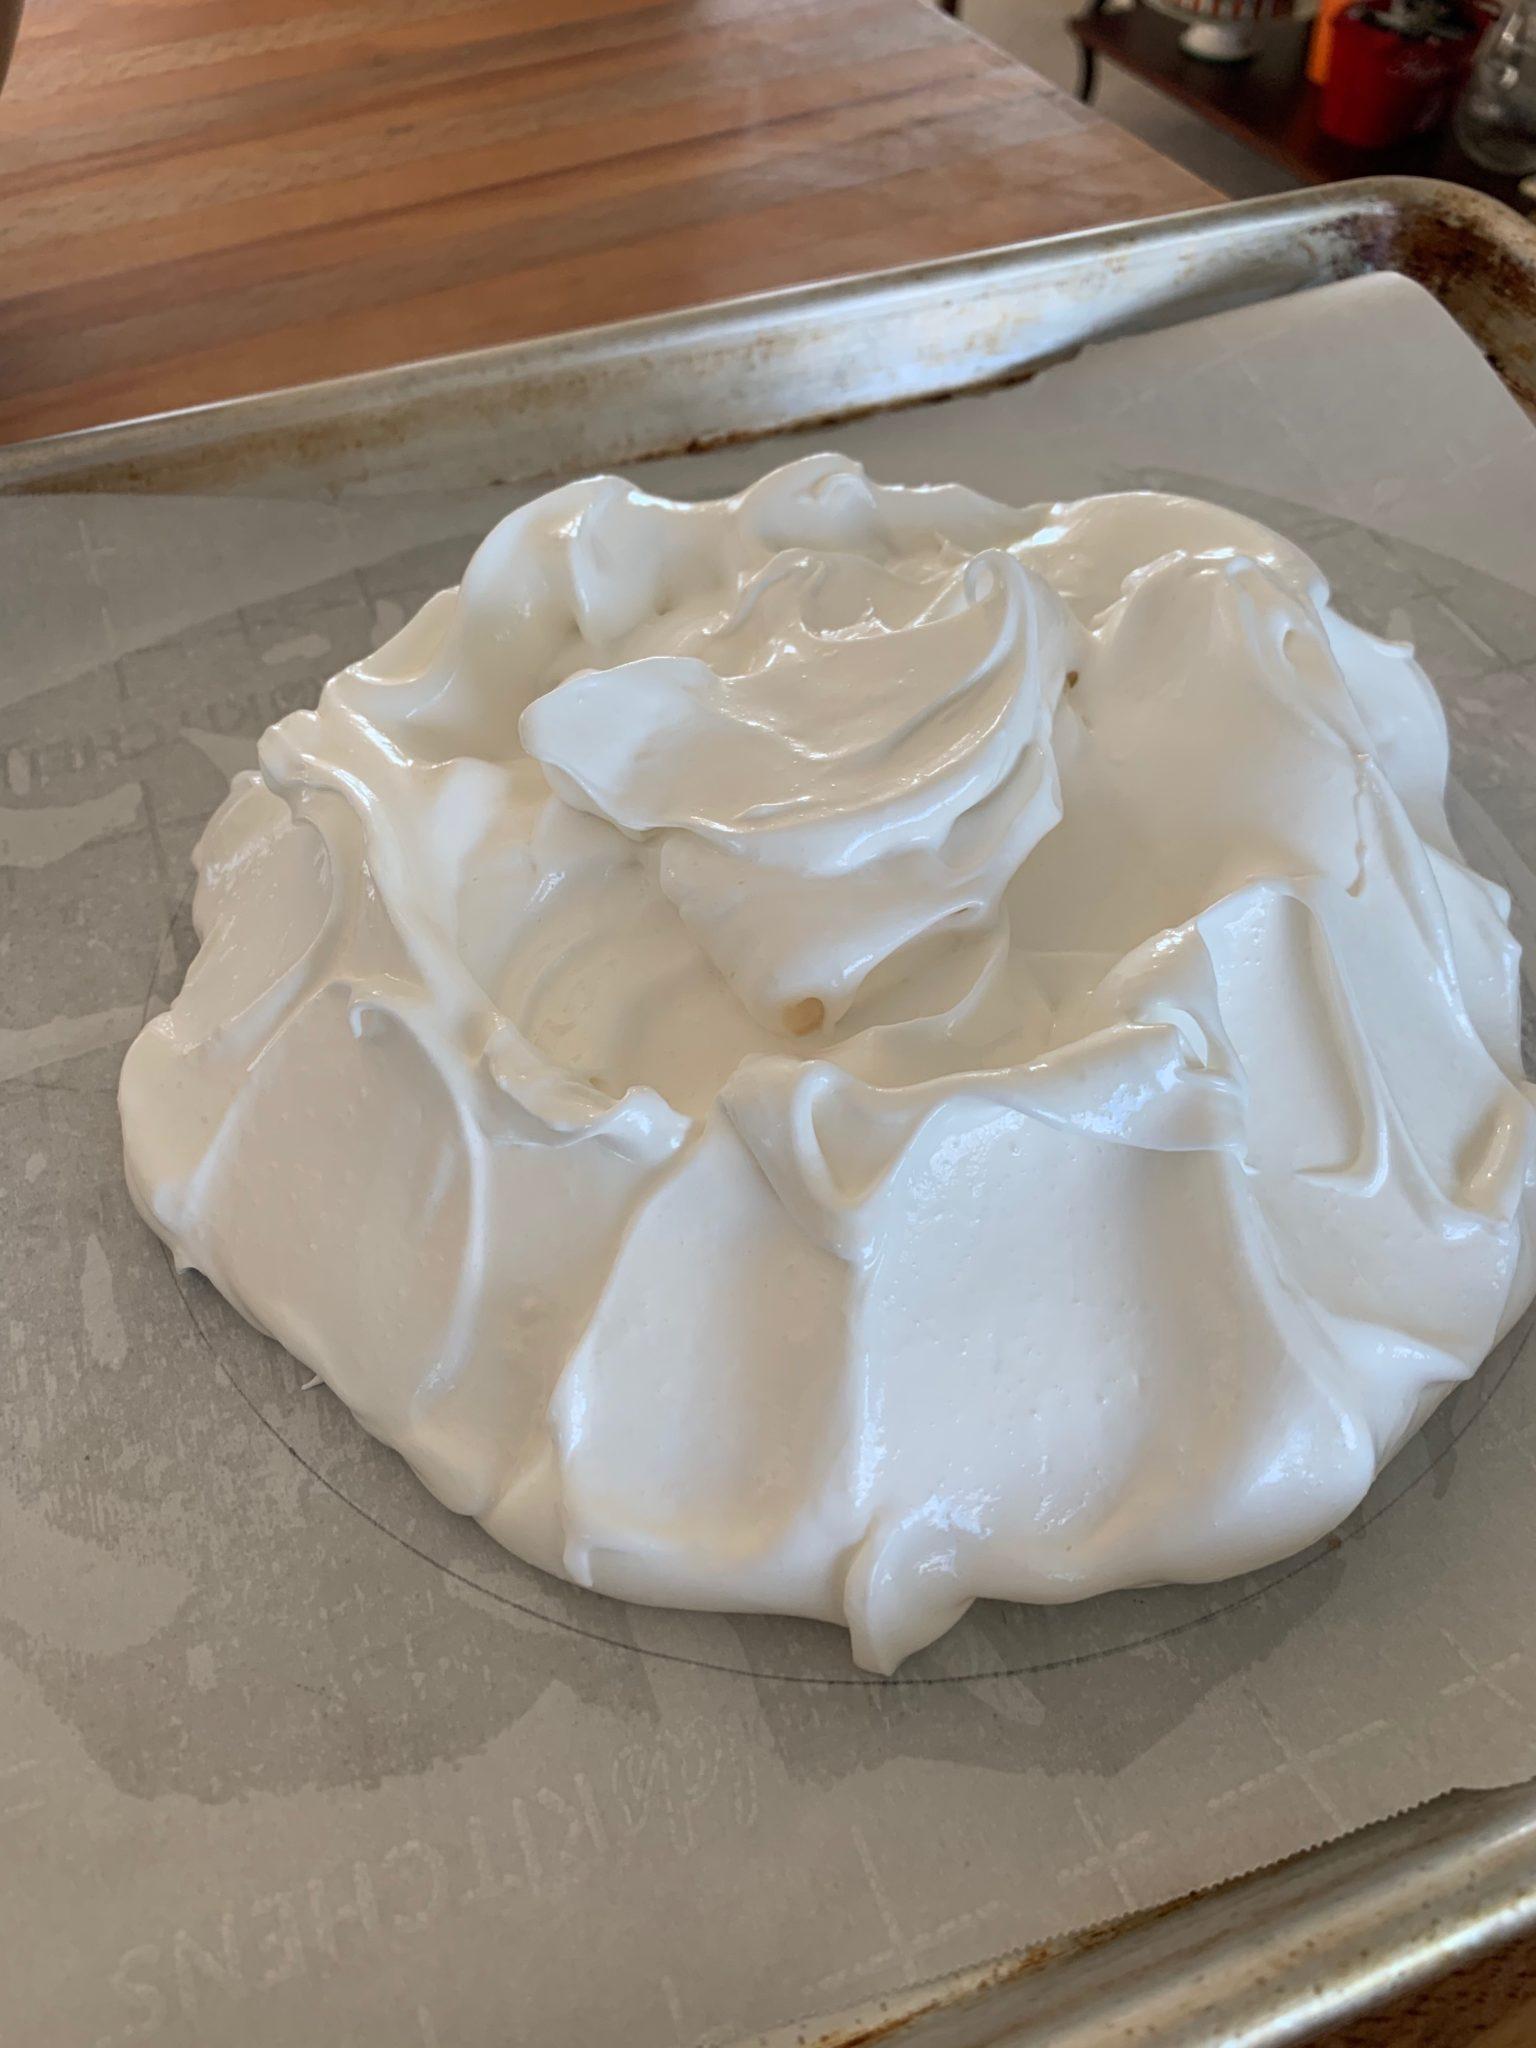 Single layer of meringue for Pavlova